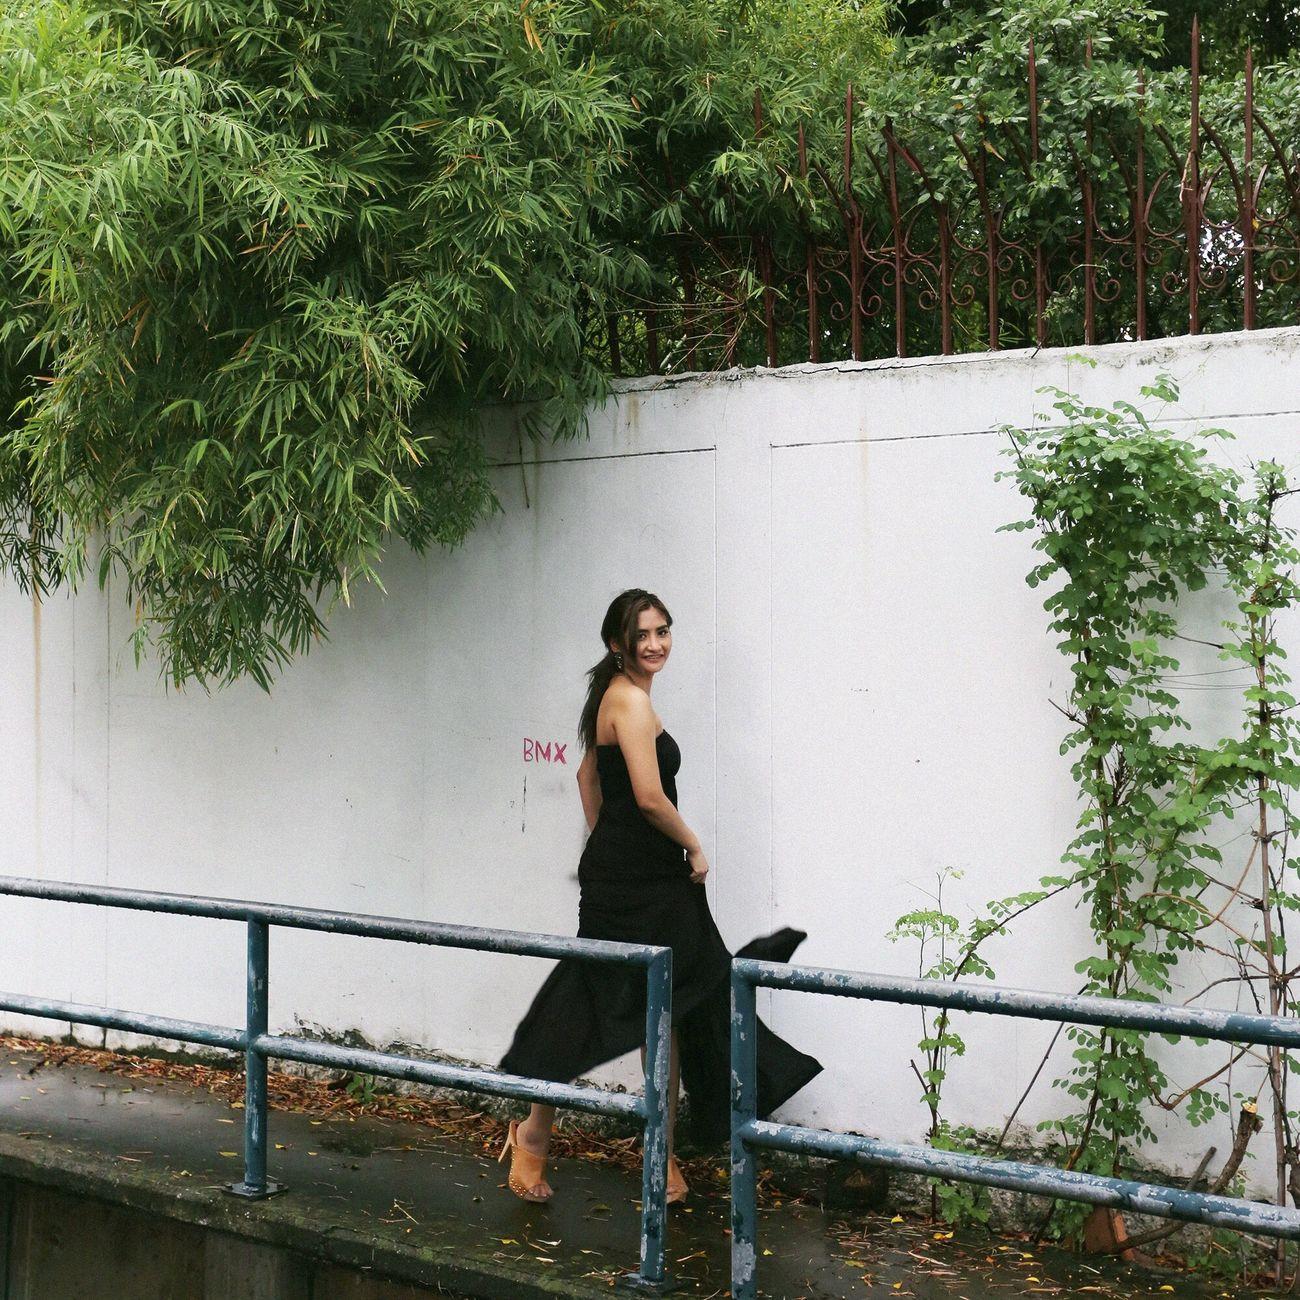 Enjoying Life Today's Hot Look Daegu, Korea Fashion&love&beauty Korean SexyGirl.♥ Me :)  Beautiful Day Looking For Trouble Bkk Thailand